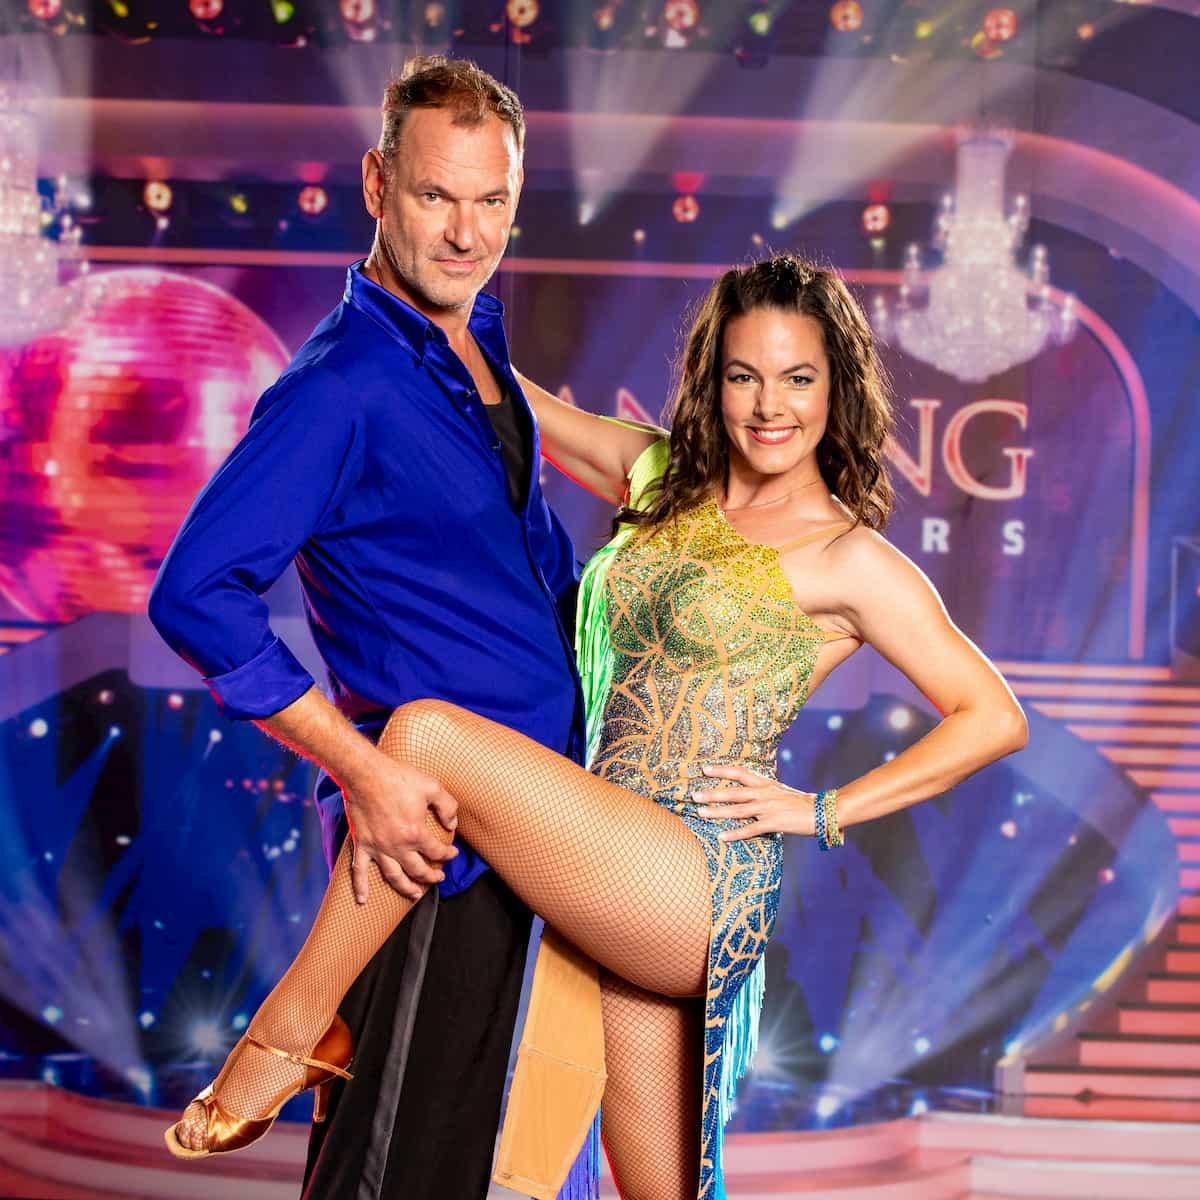 Christian Dolezal und Roswitha Wieland - Dancing Stars 25.9.2020